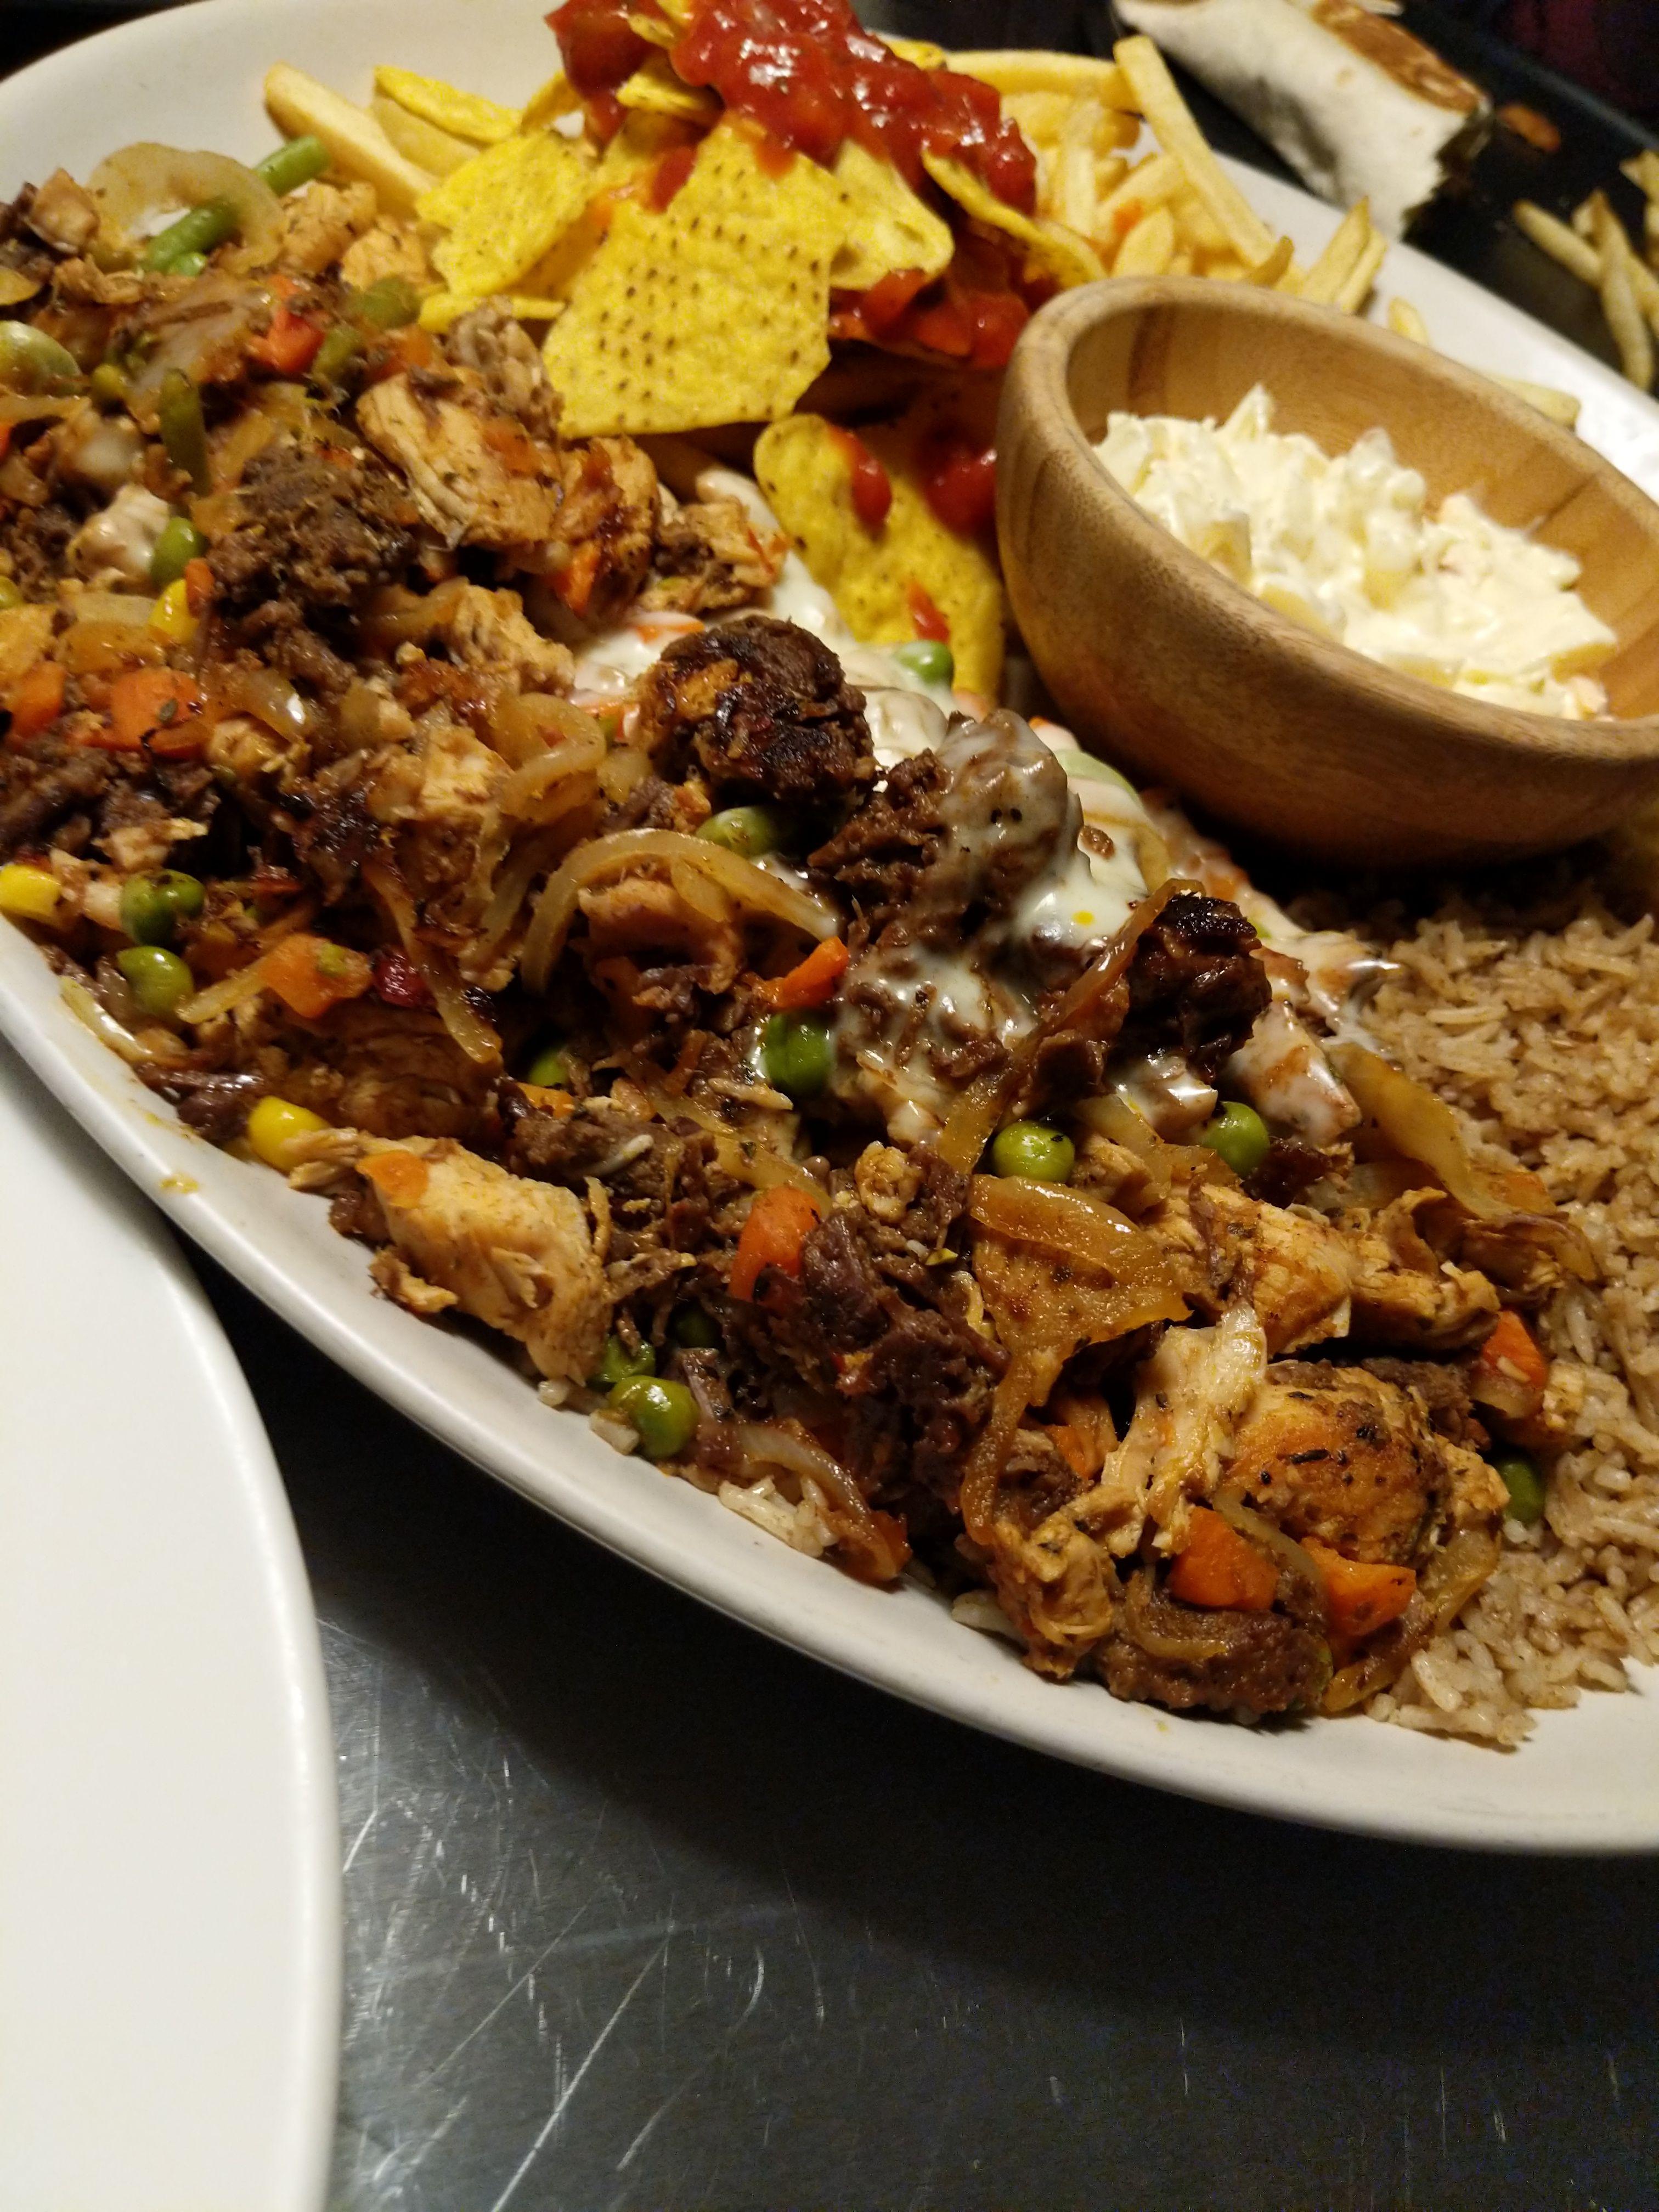 The Food Box Review Burnage Manchester Hmc Certified Halal Recipes Food Vegetarian Cookbook